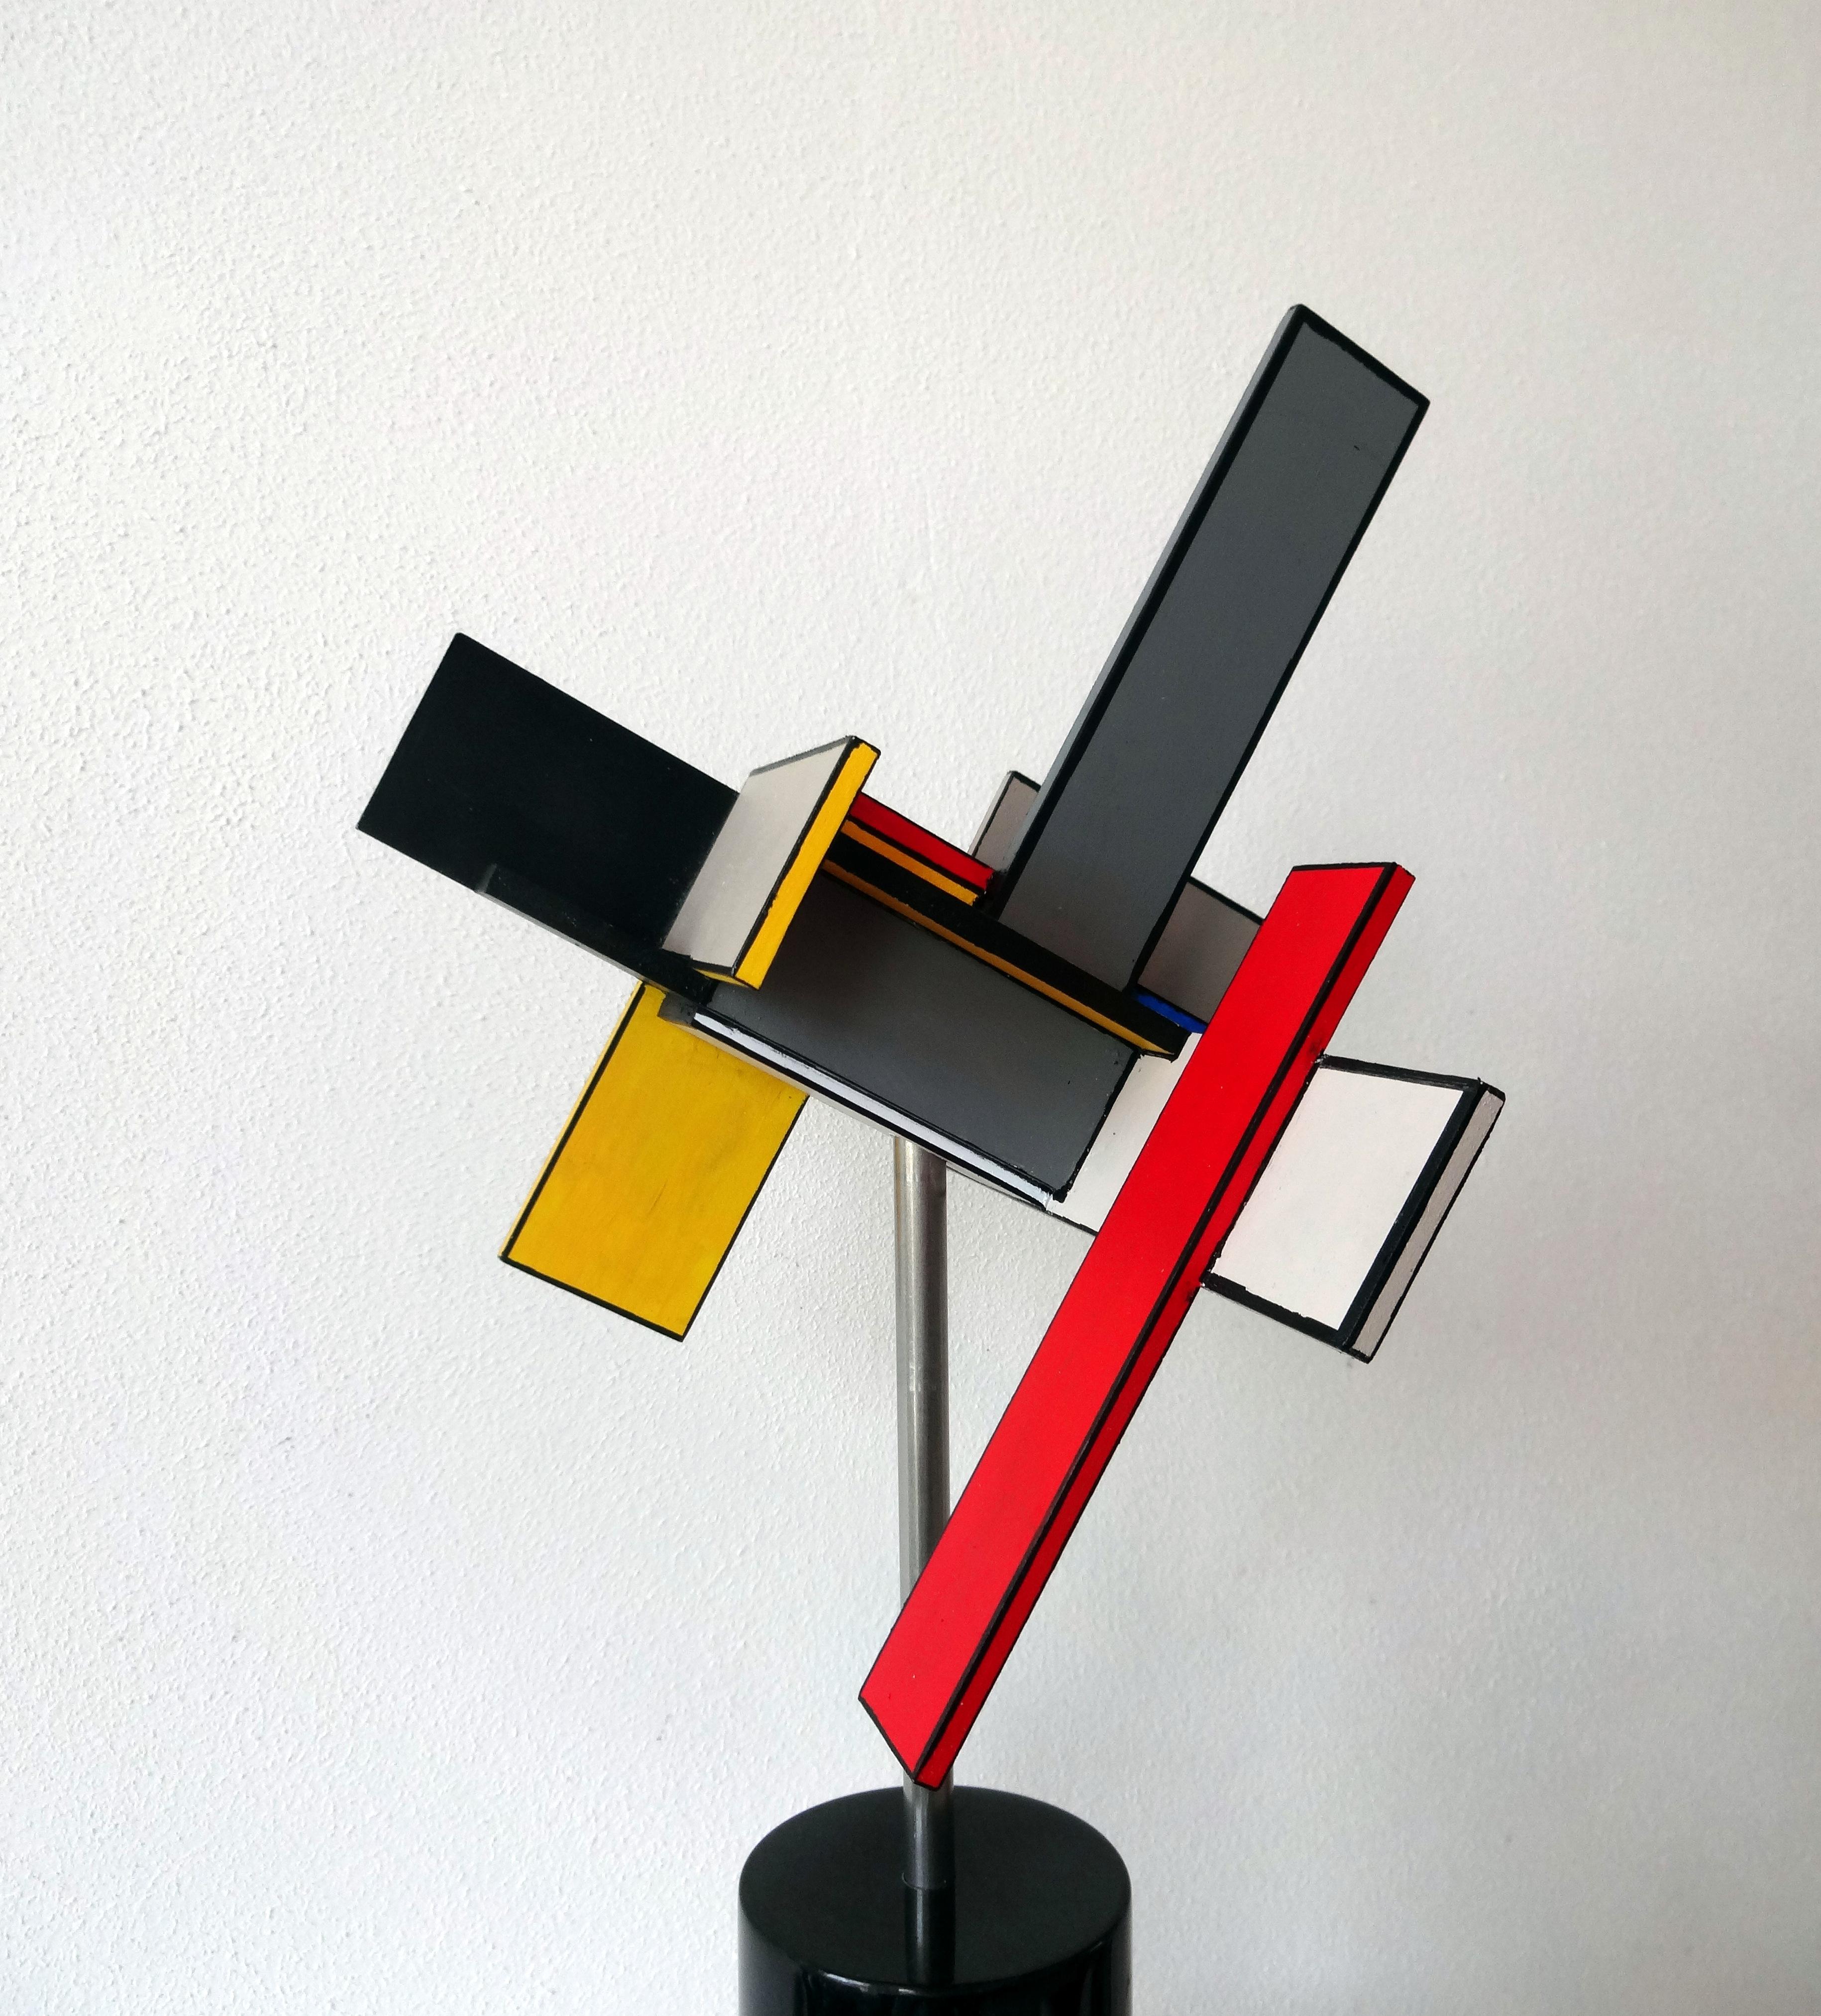 Knipoog naar Malevich